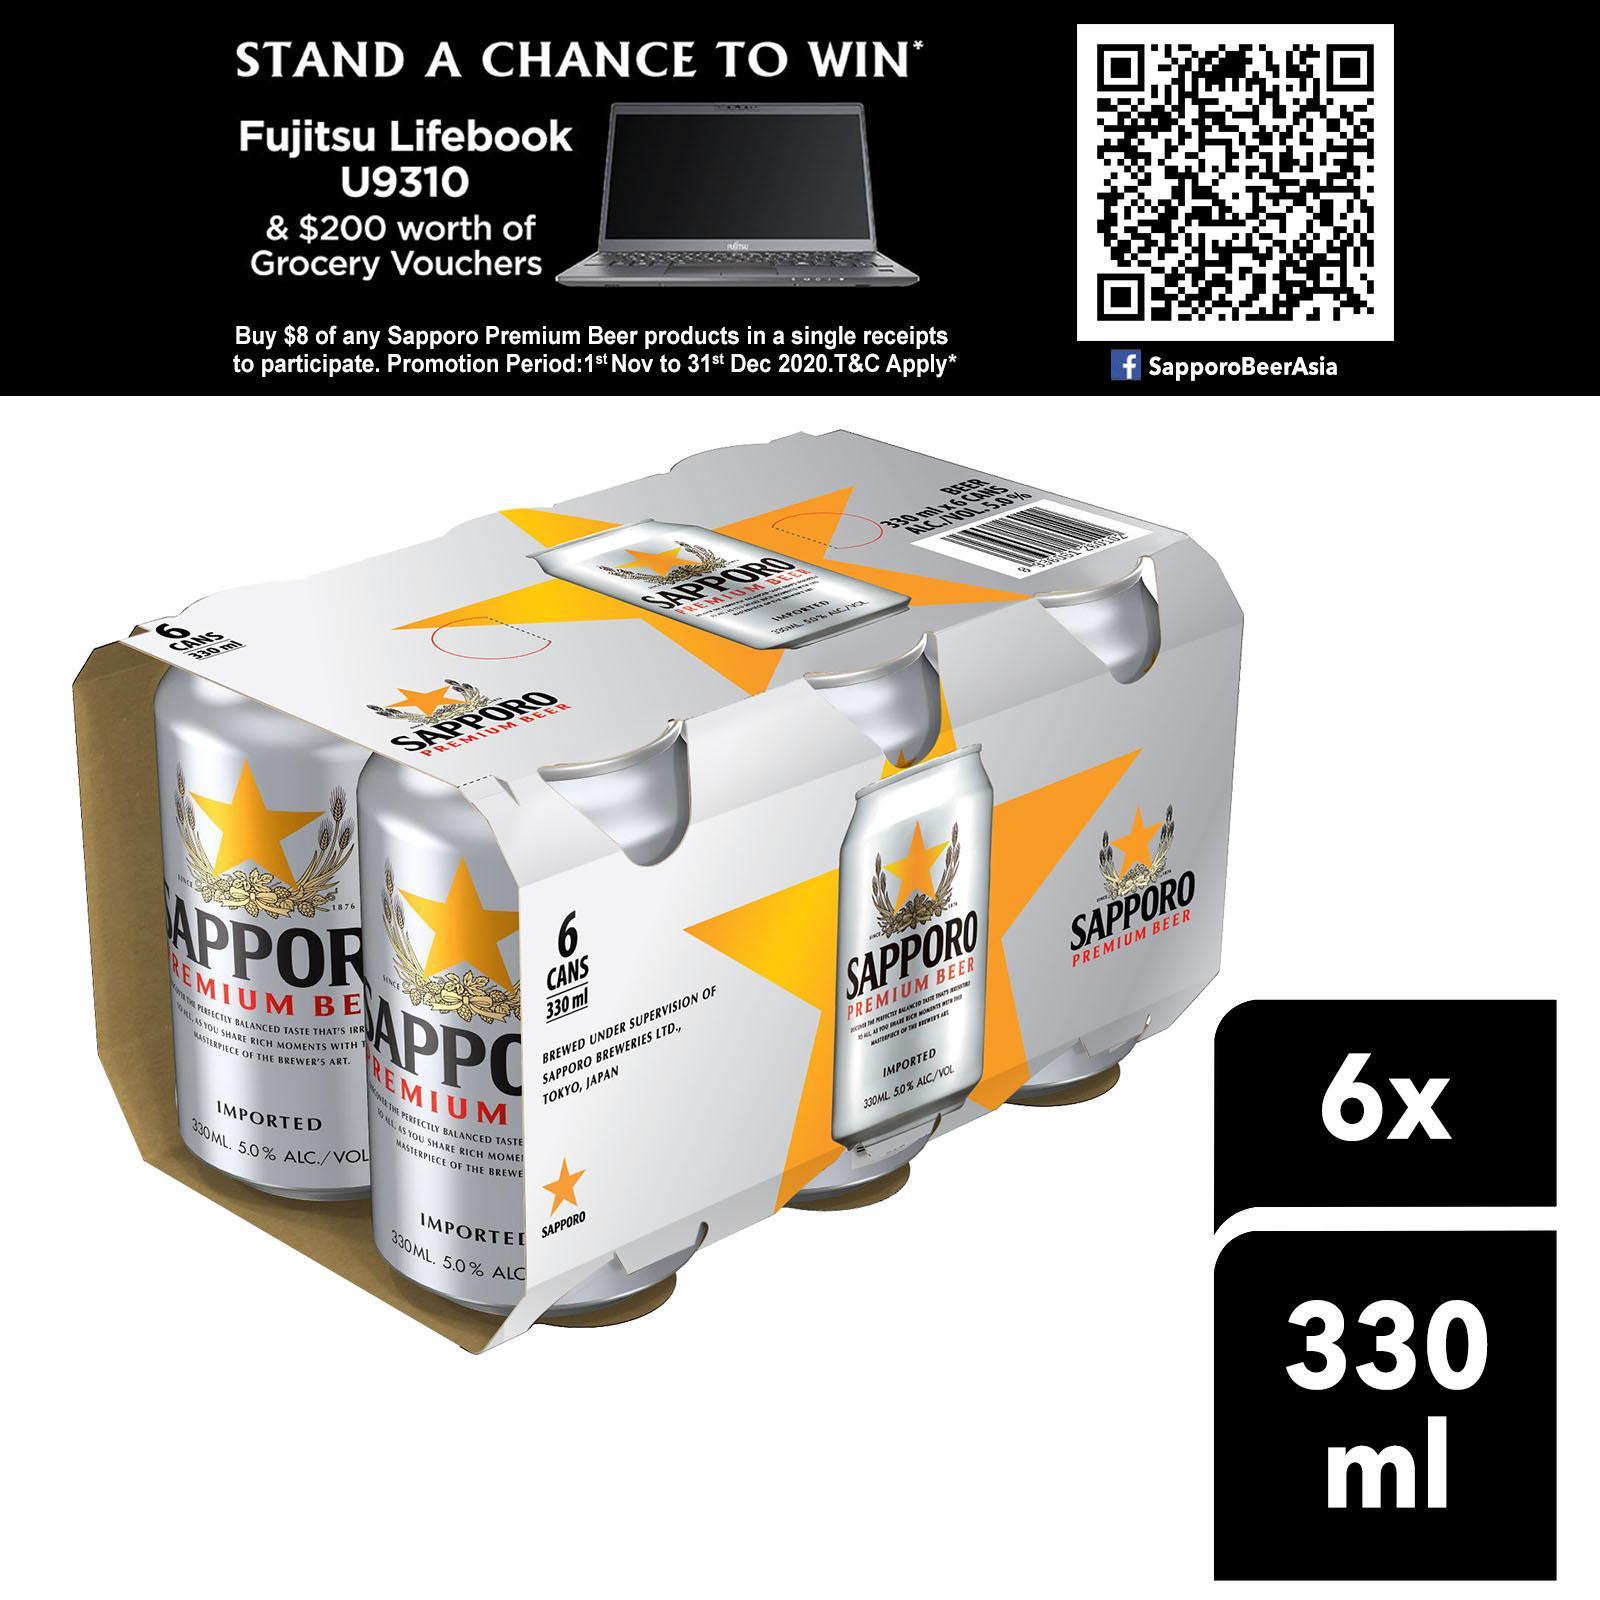 Sapporo Premium Draft Beer (6 x 330ml)